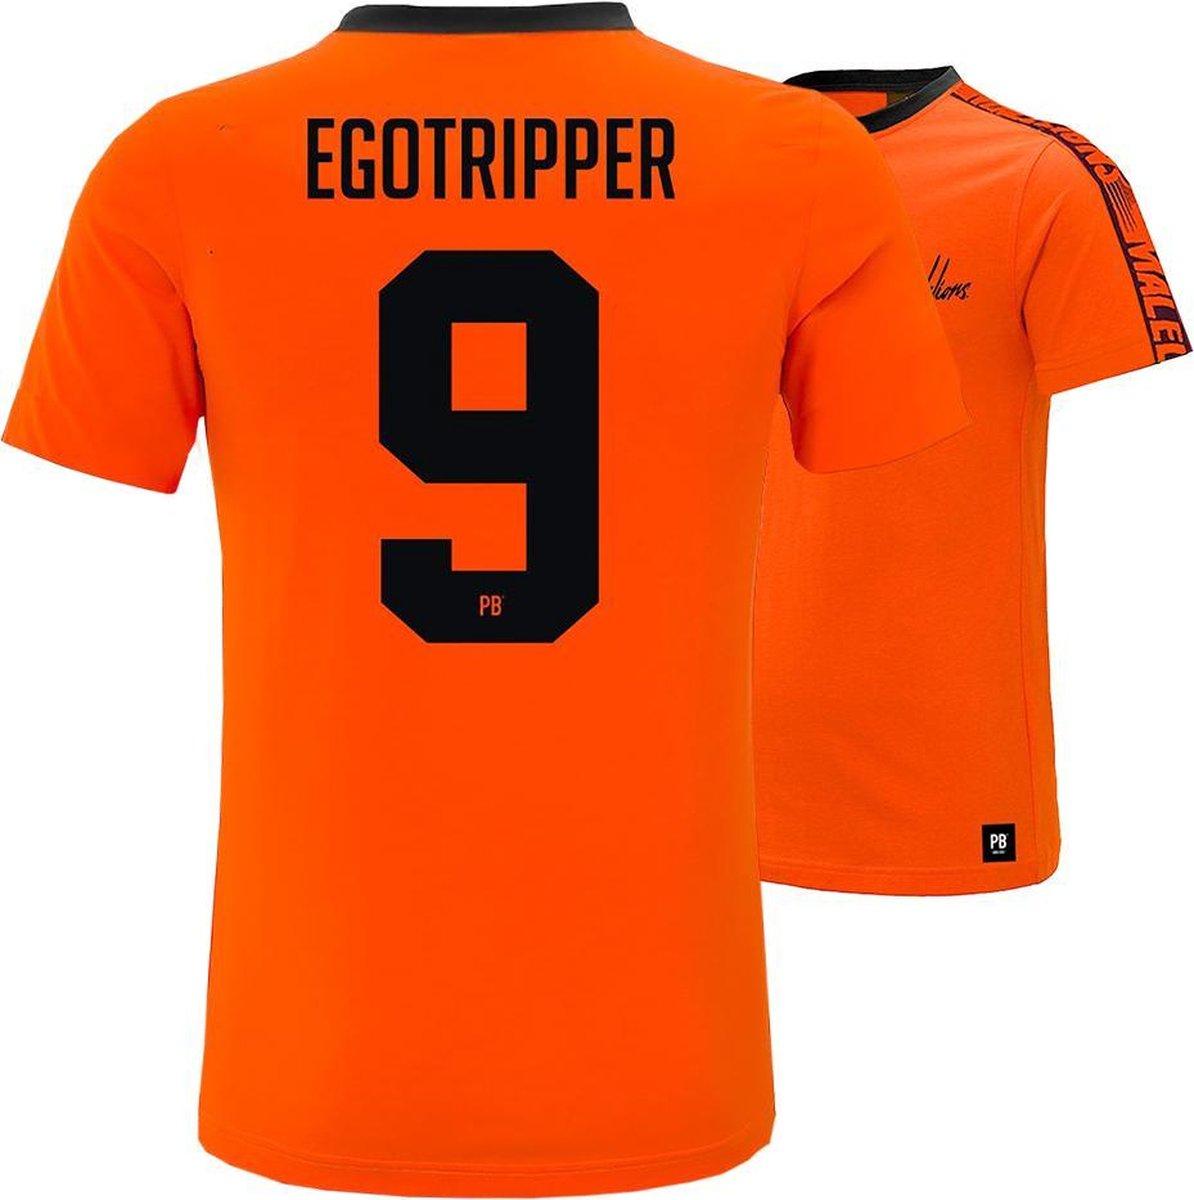 PB x Malelions - 9. Egotripper   Maat XL   Oranje T-shirt   EK voetbal 2021   Heren en dames